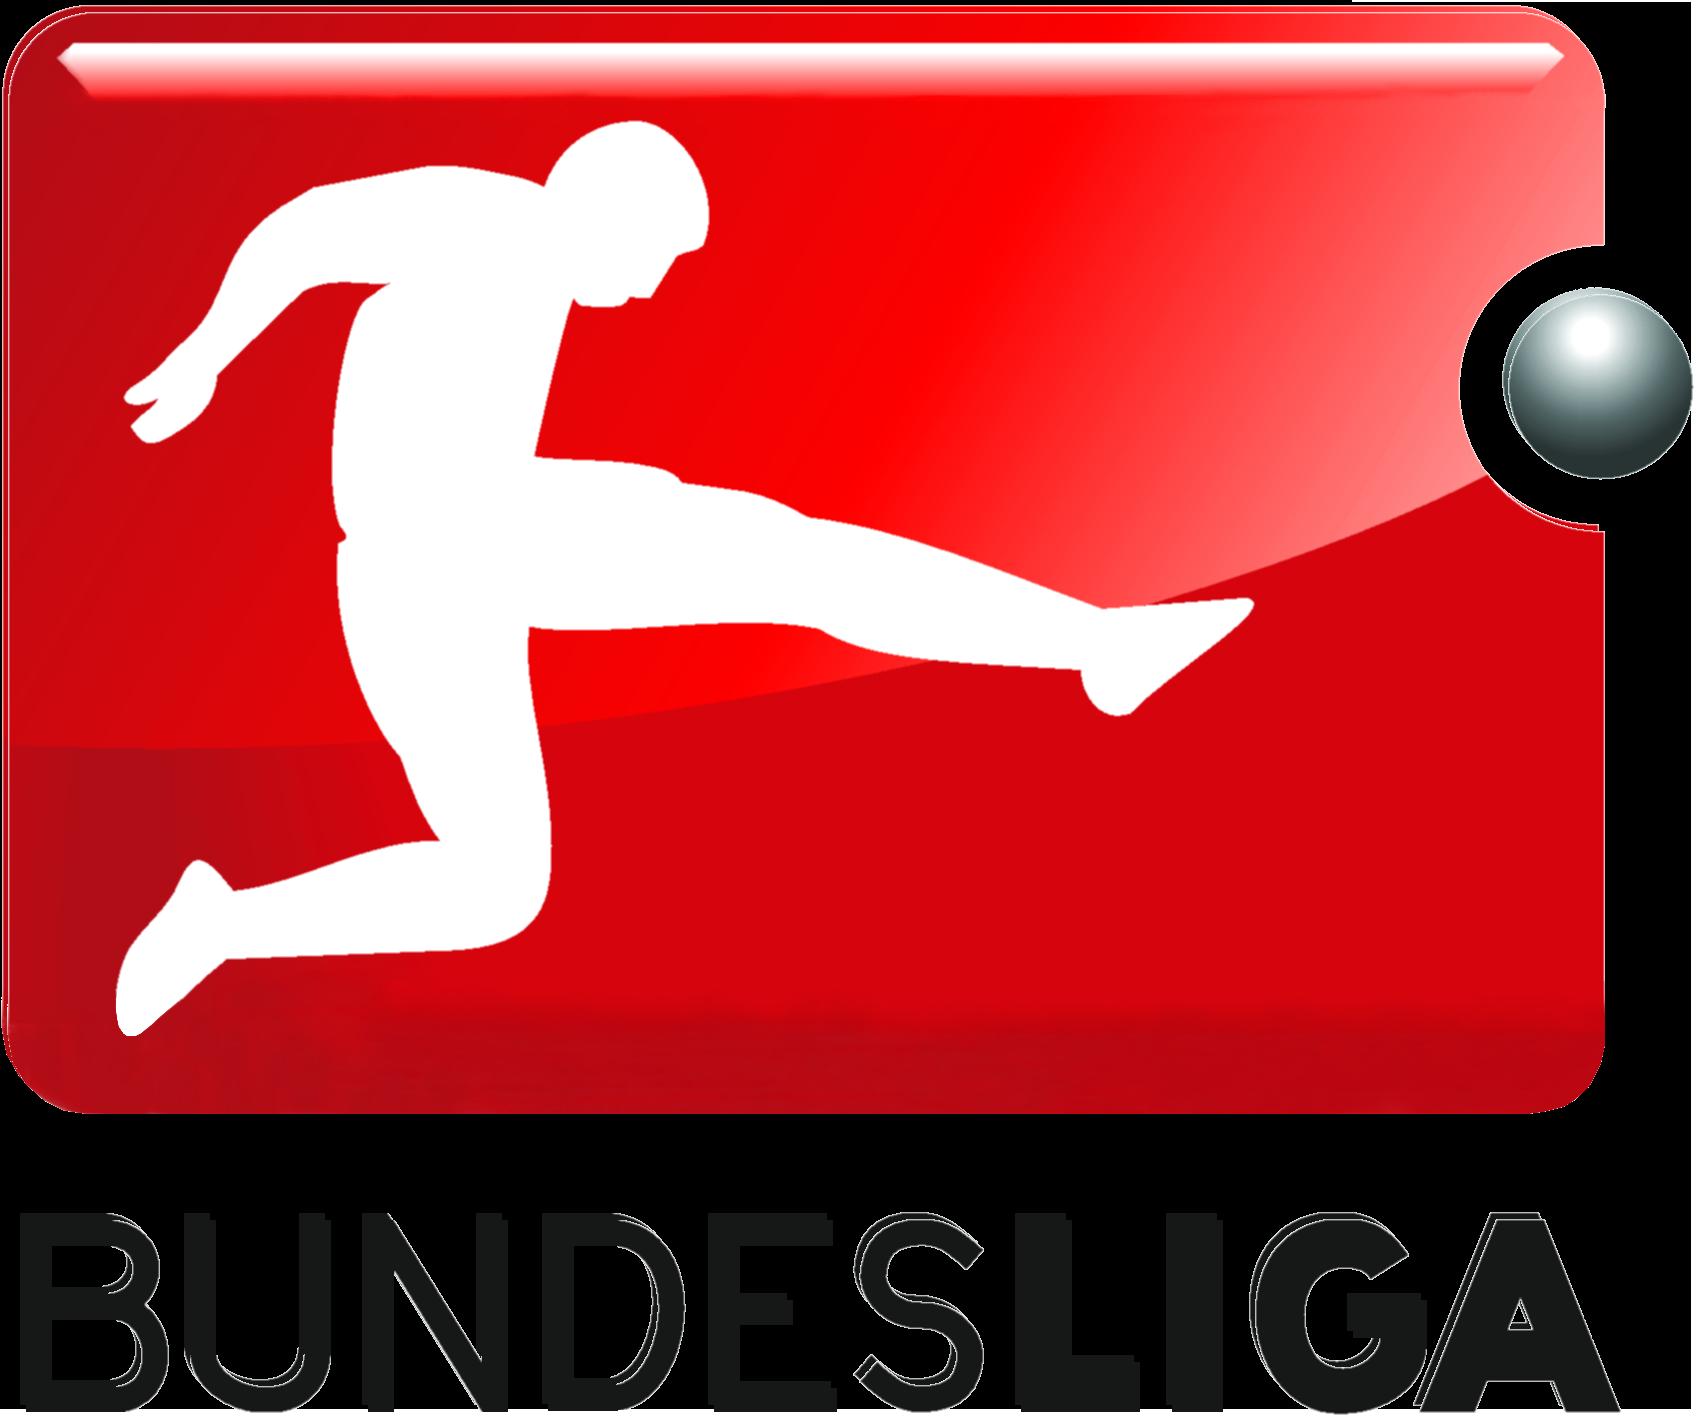 Torschützenkönig 1 Bundesliga